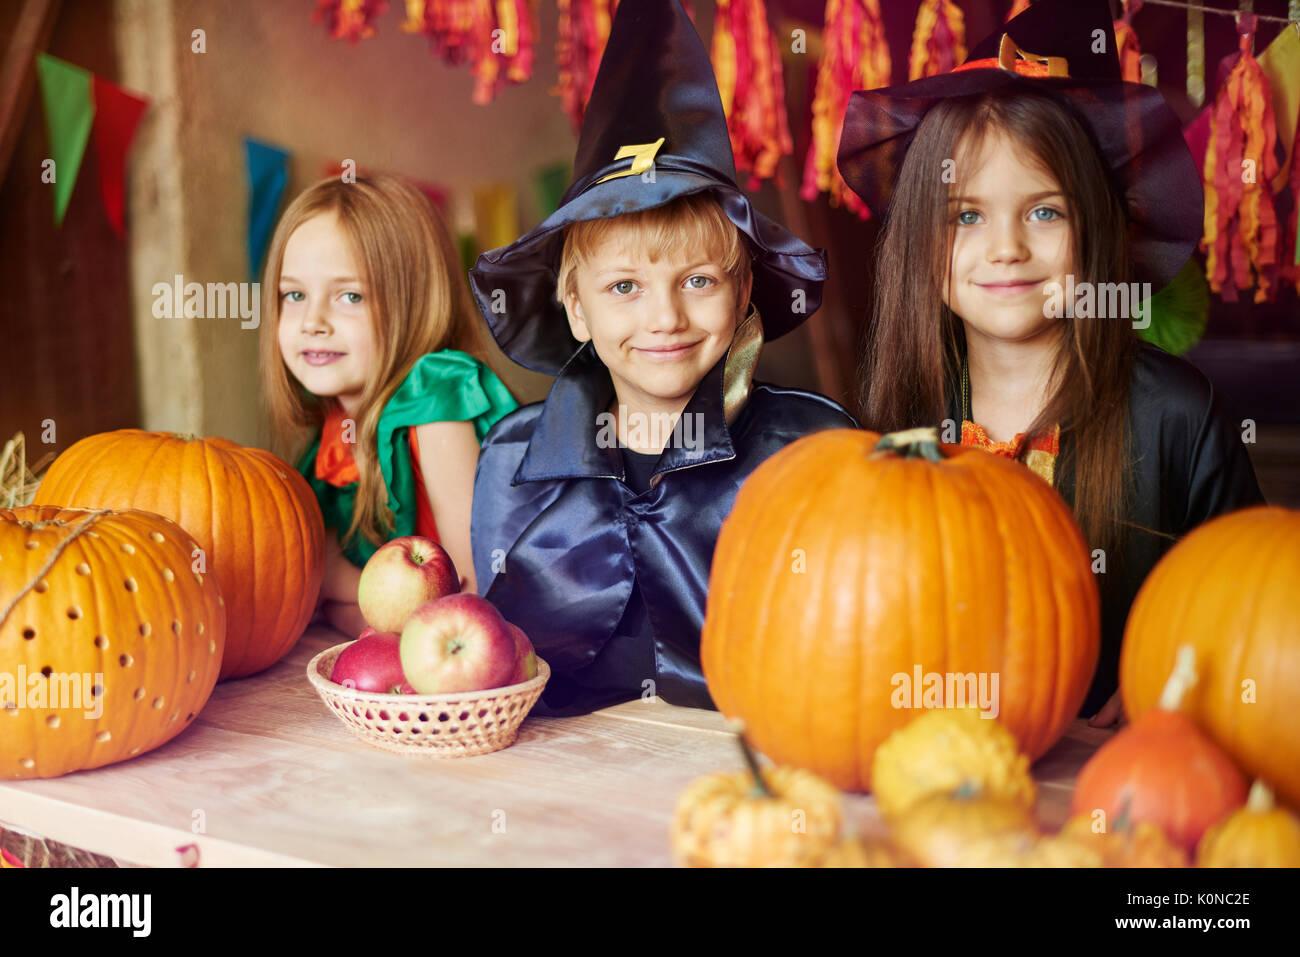 Portrait of children dressed in Halloween costumes - Stock Image